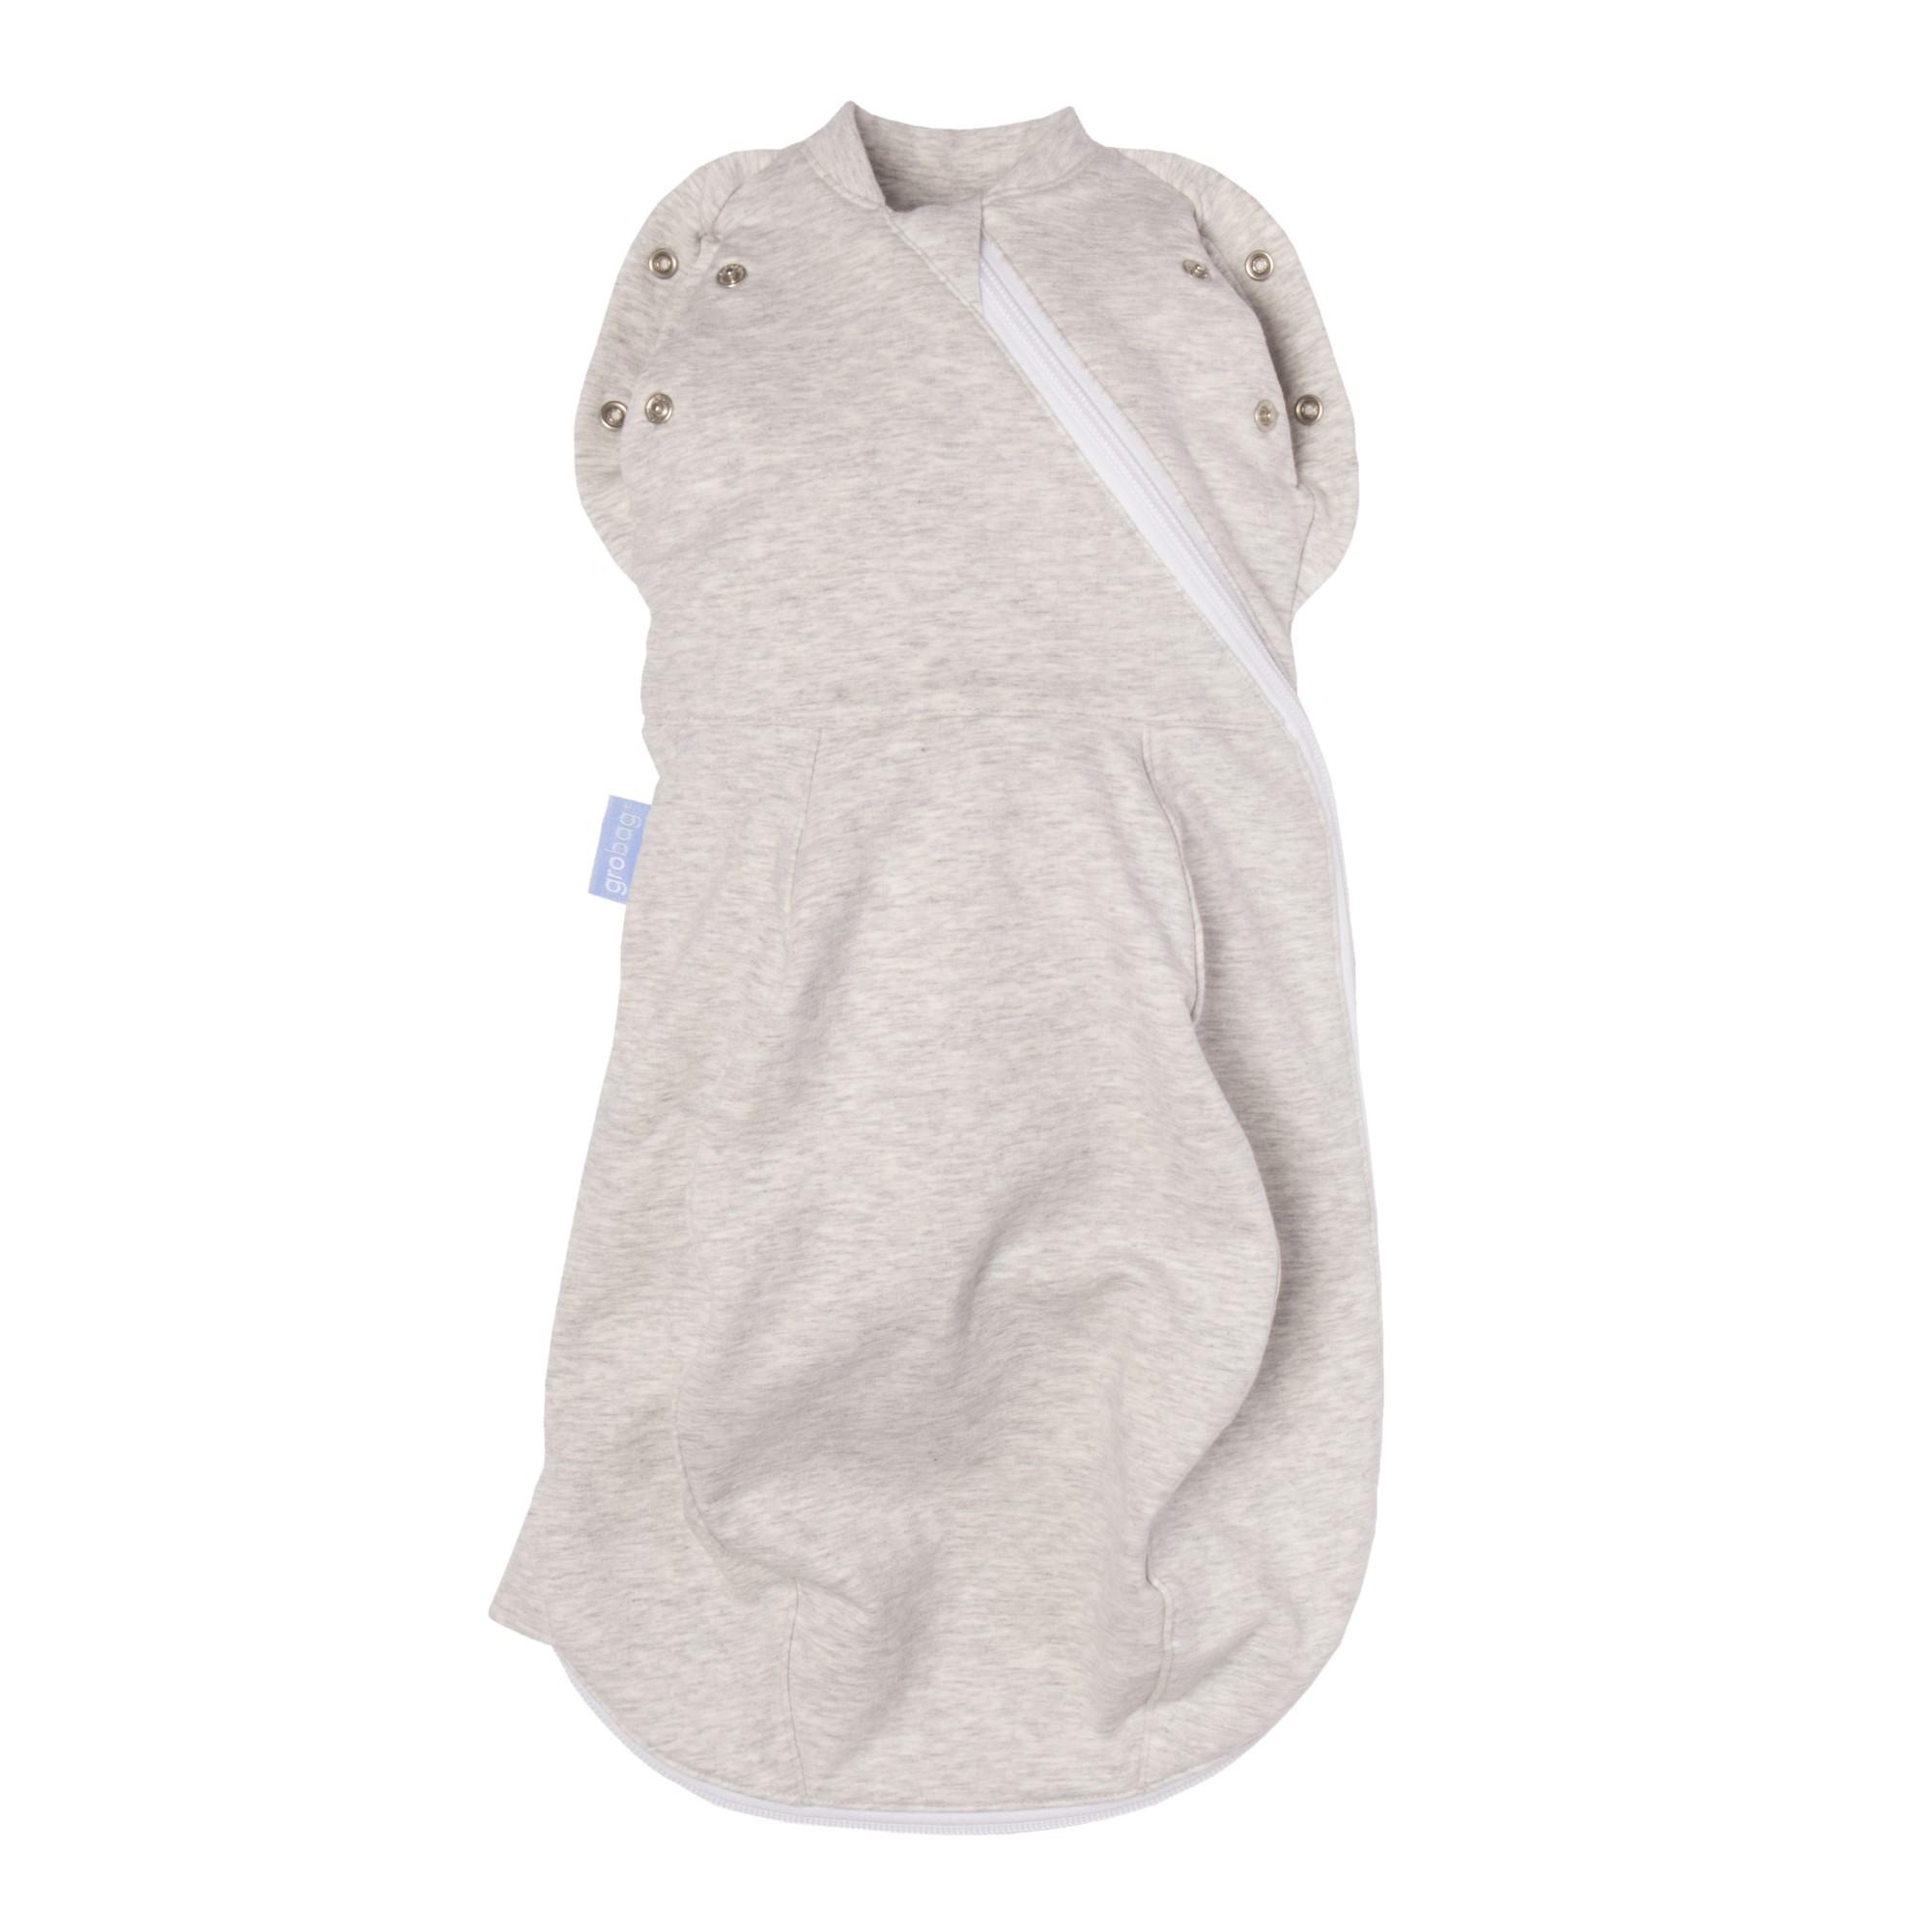 Sac de dormit cu sistem de infasat, Grey Marl, Gros, 0-3 luni, Gro